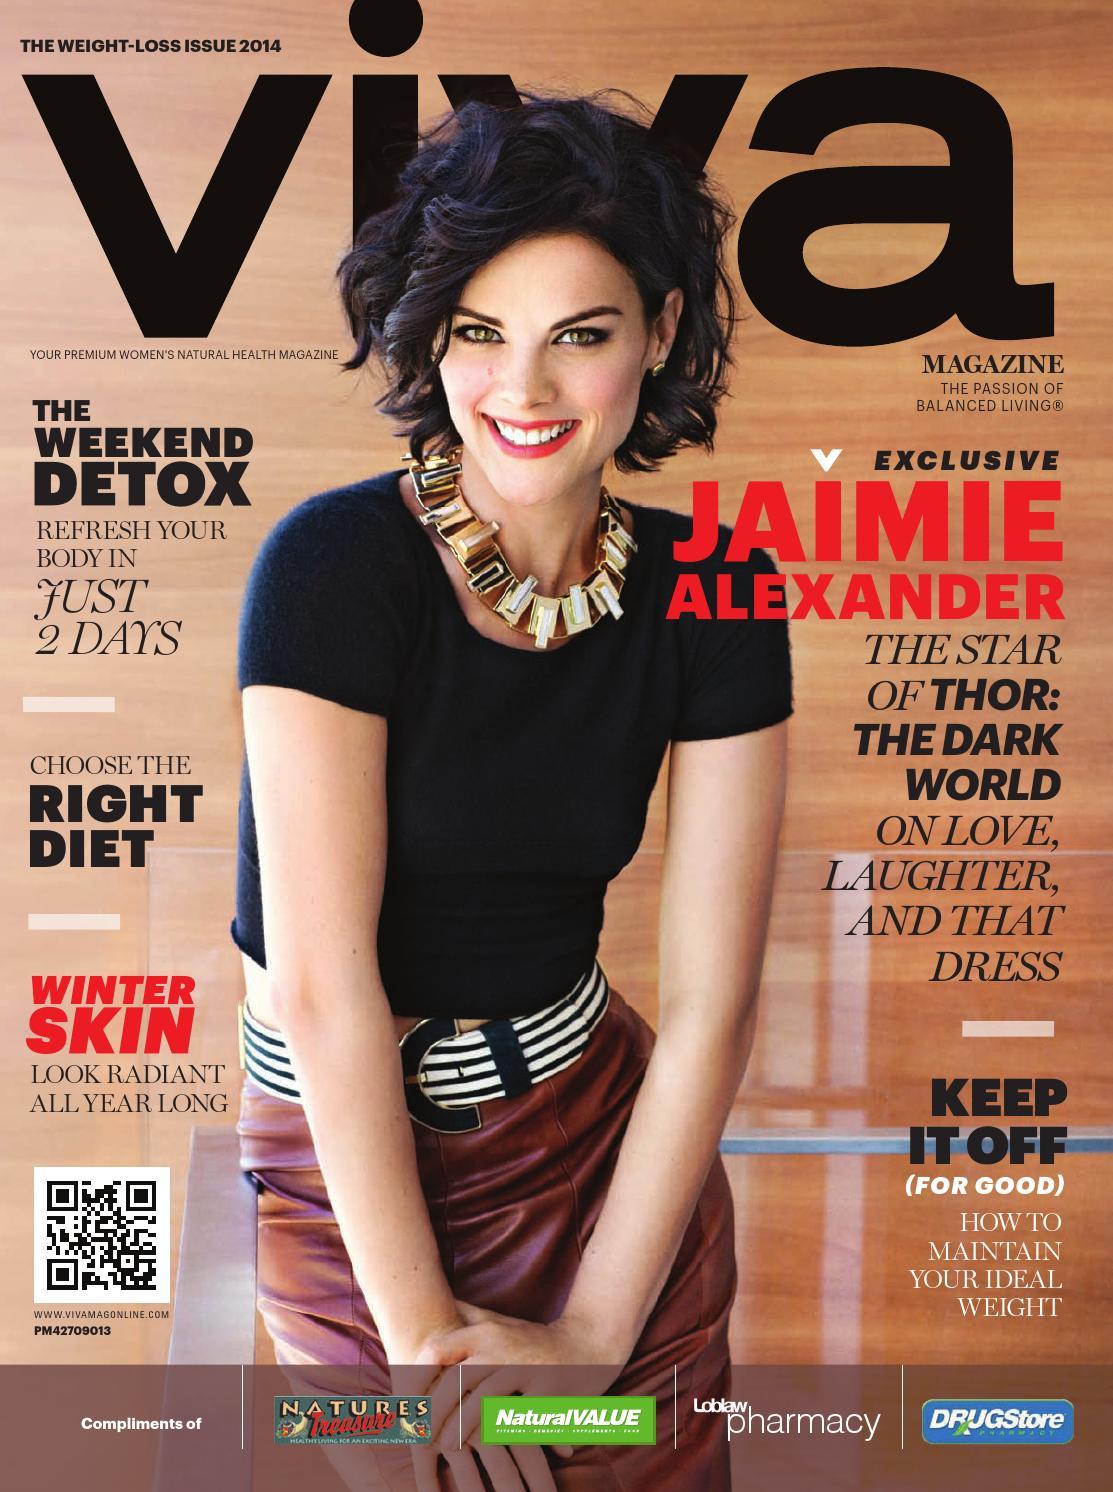 Viva Magazine  WeightLoss  2014 by Rive Gauche Media